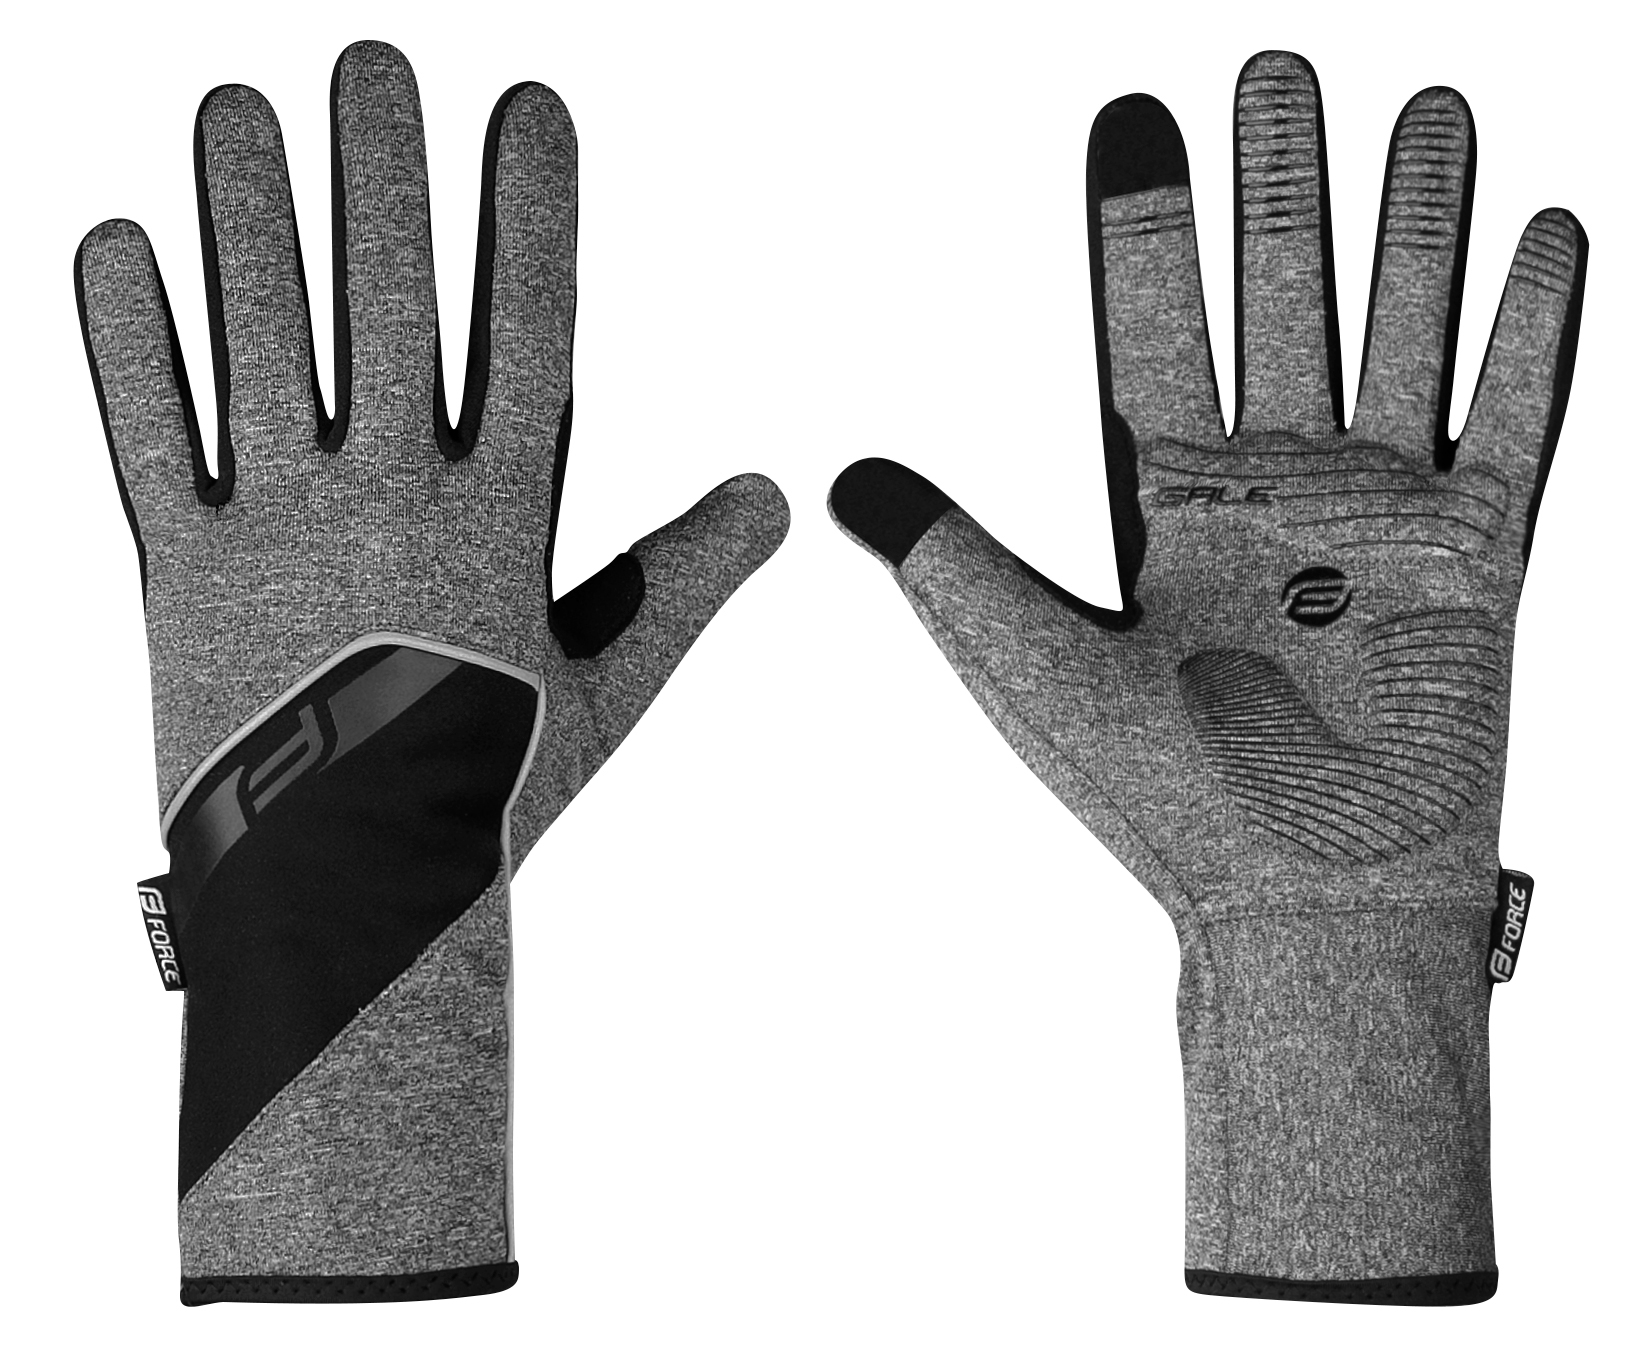 rukavice FORCE GALE softshell, jaro-podzim, šedé XS